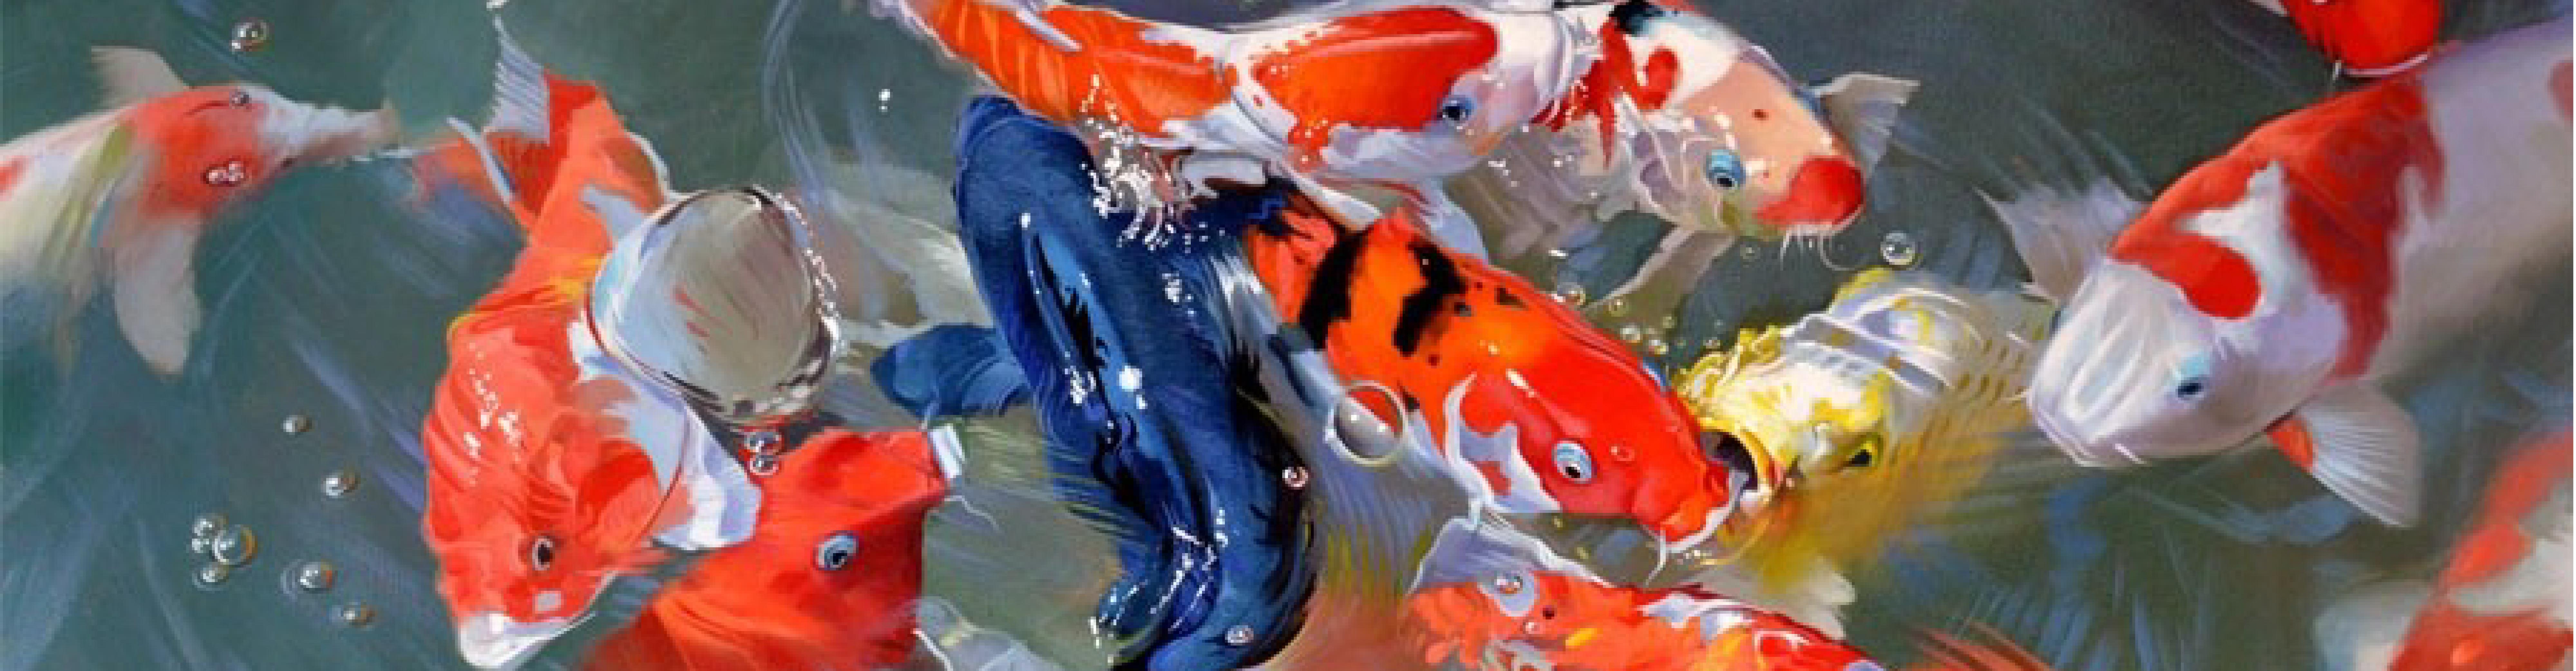 106 alimentation poisson l 39 alimentation des poissons for Alimentation poisson rouge bassin